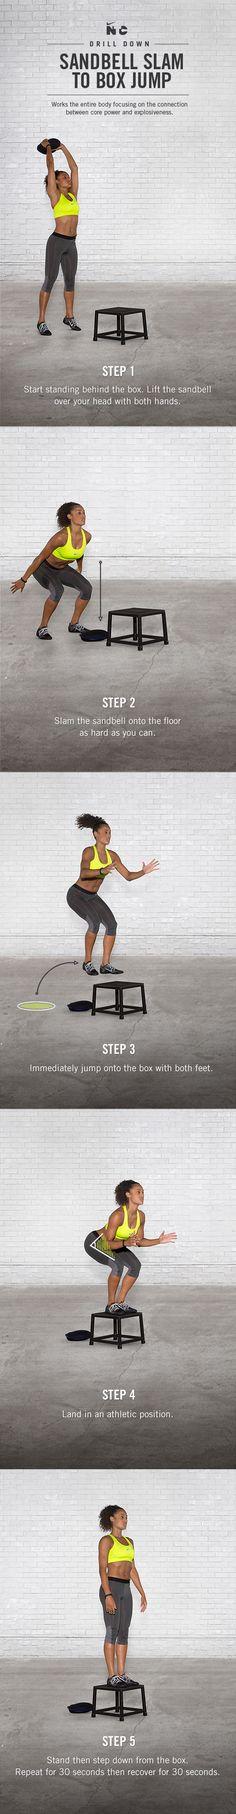 Sandbell Slam to Box Jump. #training #boxjump #thighs #hips #burn